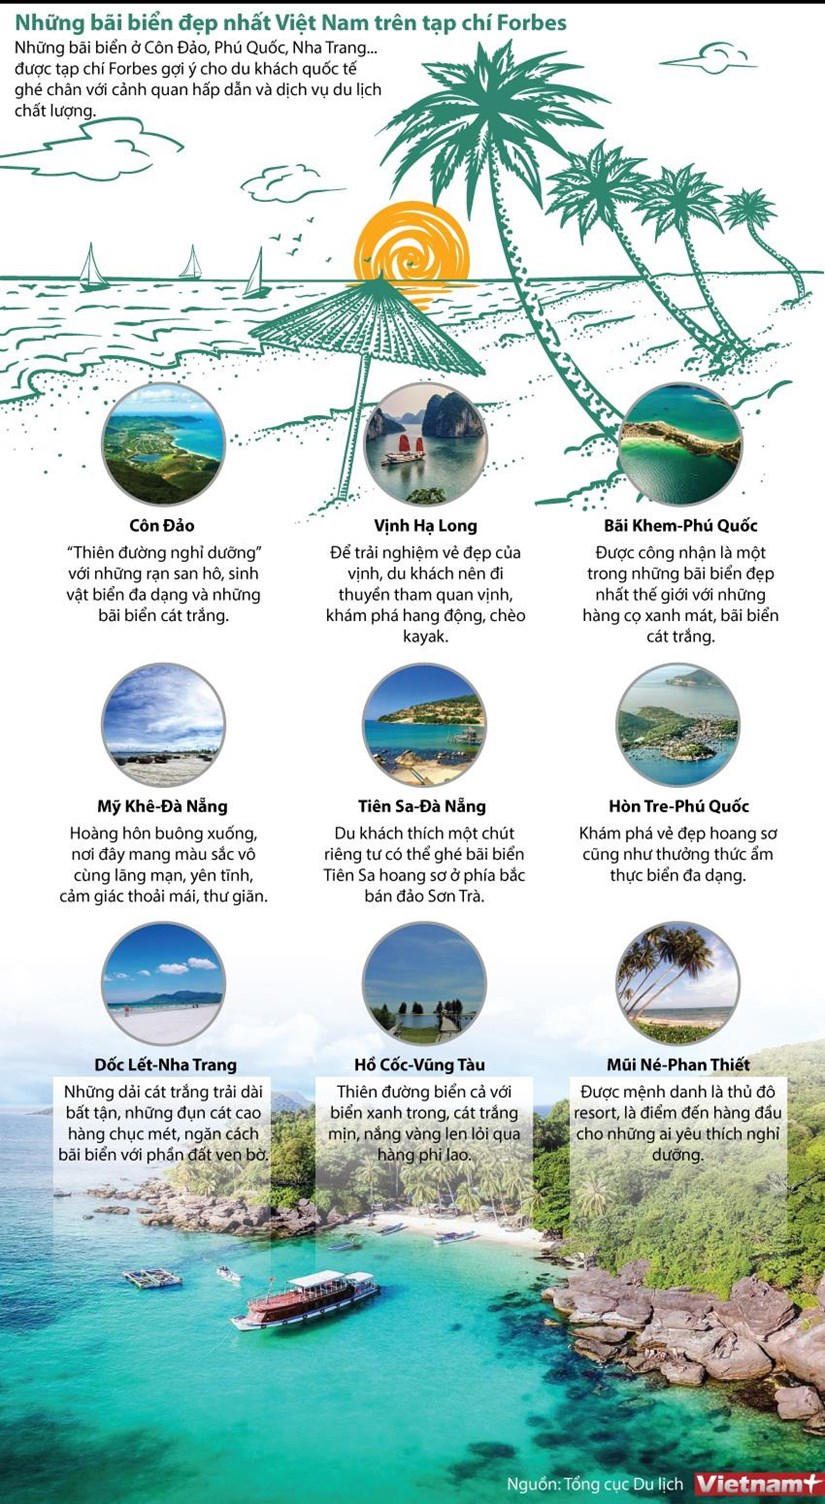 [Infographics] Nhung bai bien dep nhat Viet Nam tren tap chi Forbes hinh anh 1